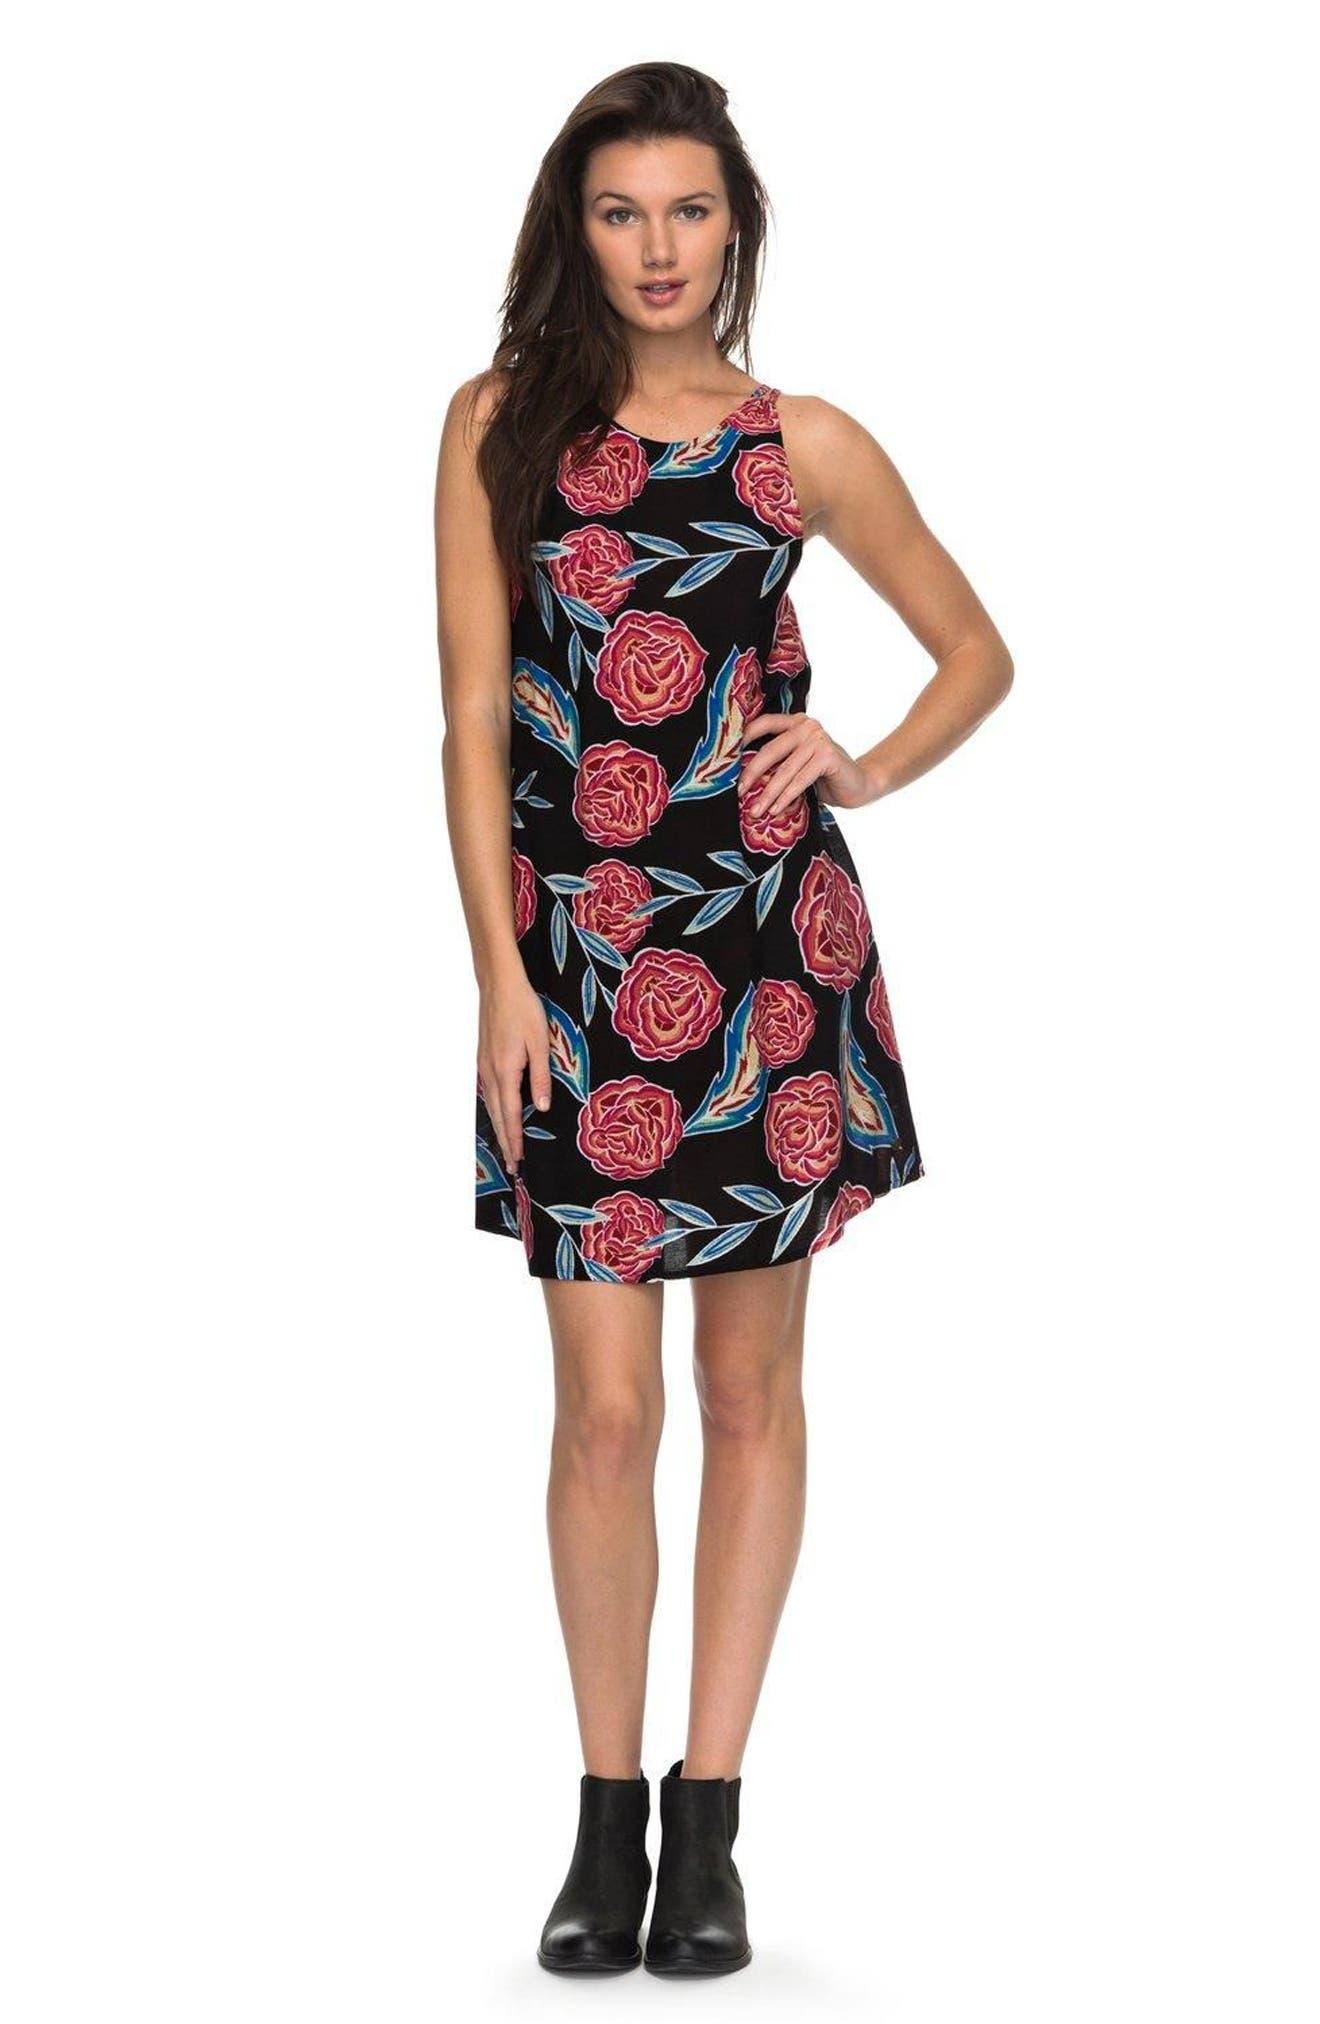 Sunburnt Land Shift Dress,                             Alternate thumbnail 2, color,                             Anthracite Mexican Roses